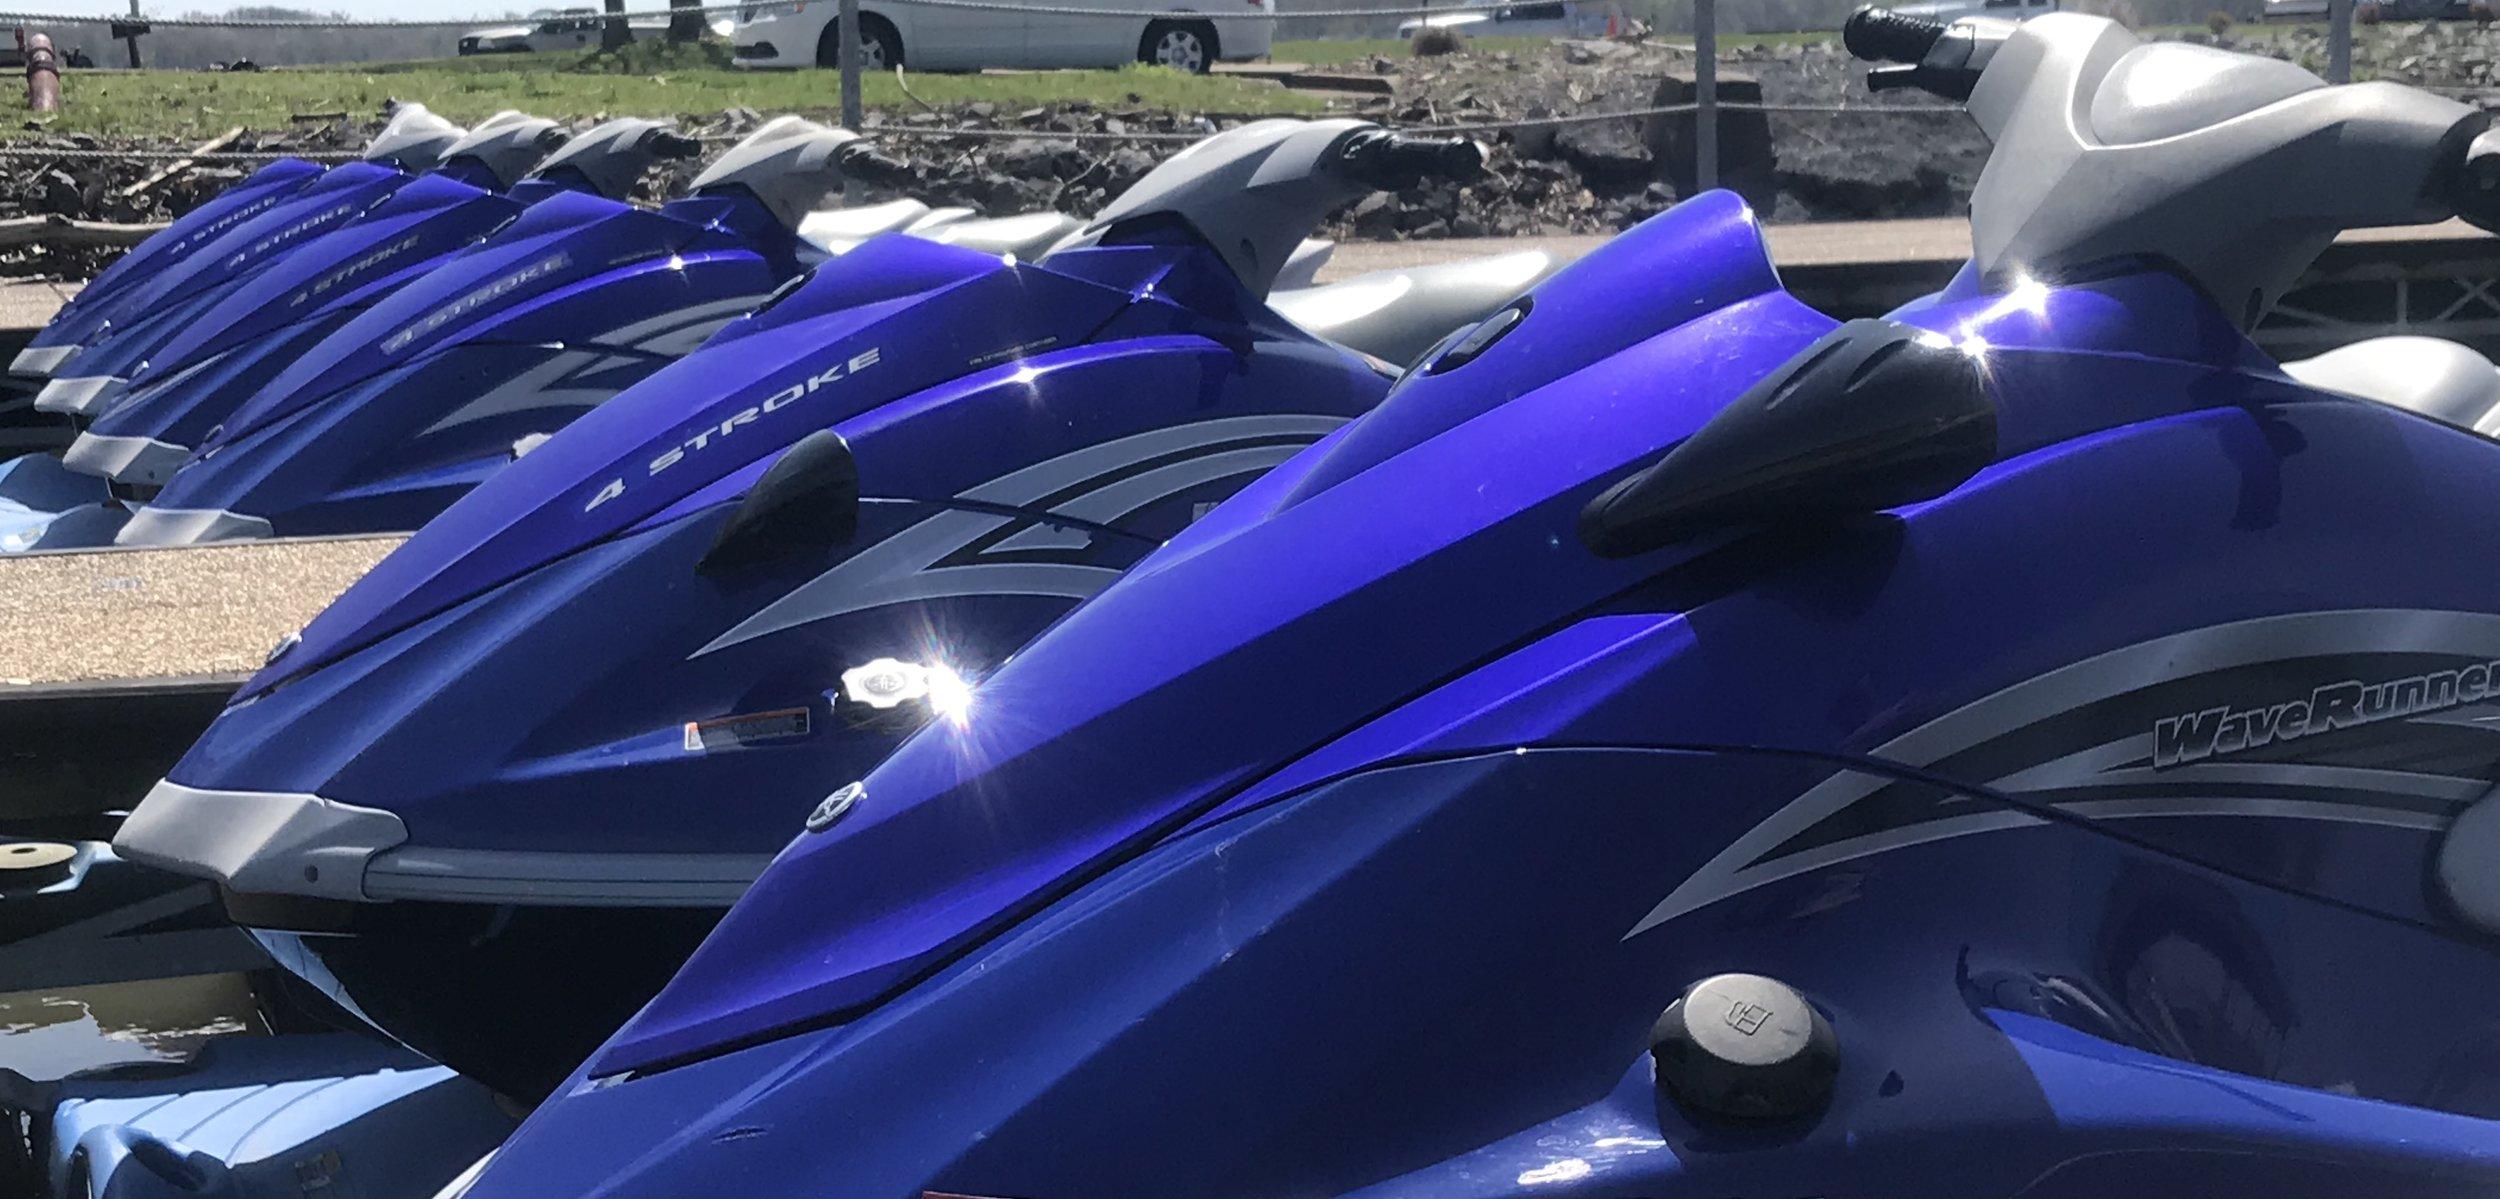 Photo - New Rental Fleet Angled View.jpg